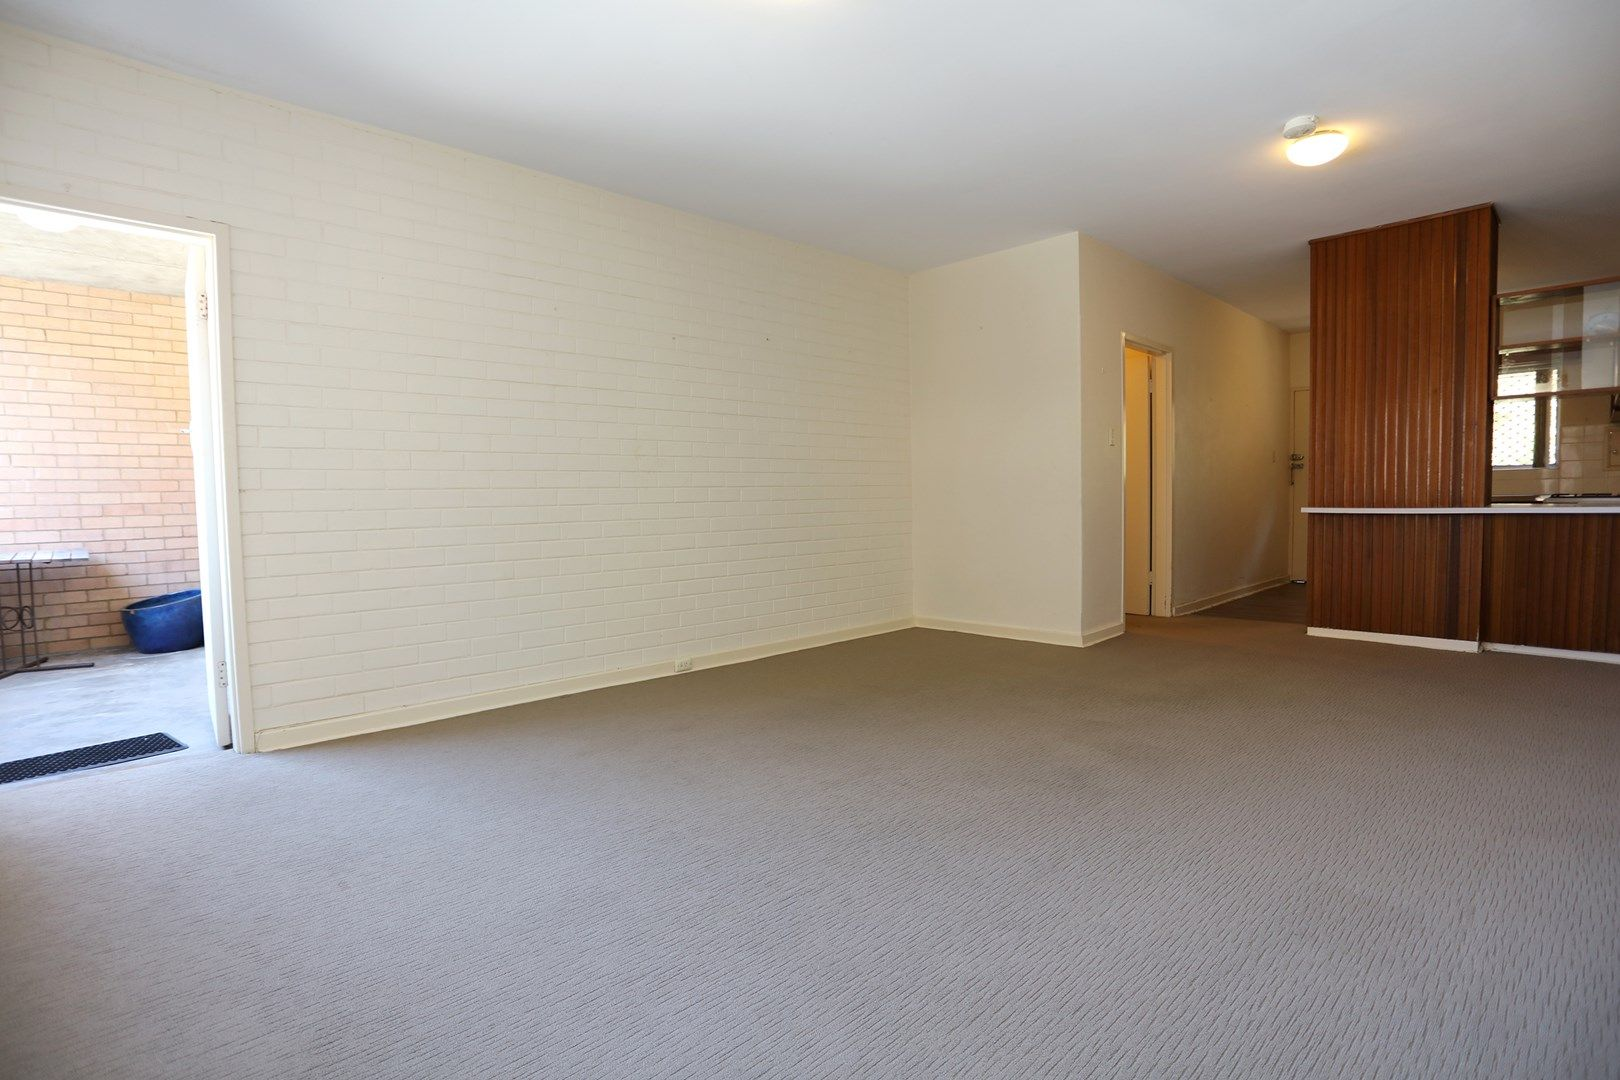 7/217 Walcott Street, North Perth WA 6006, Image 0